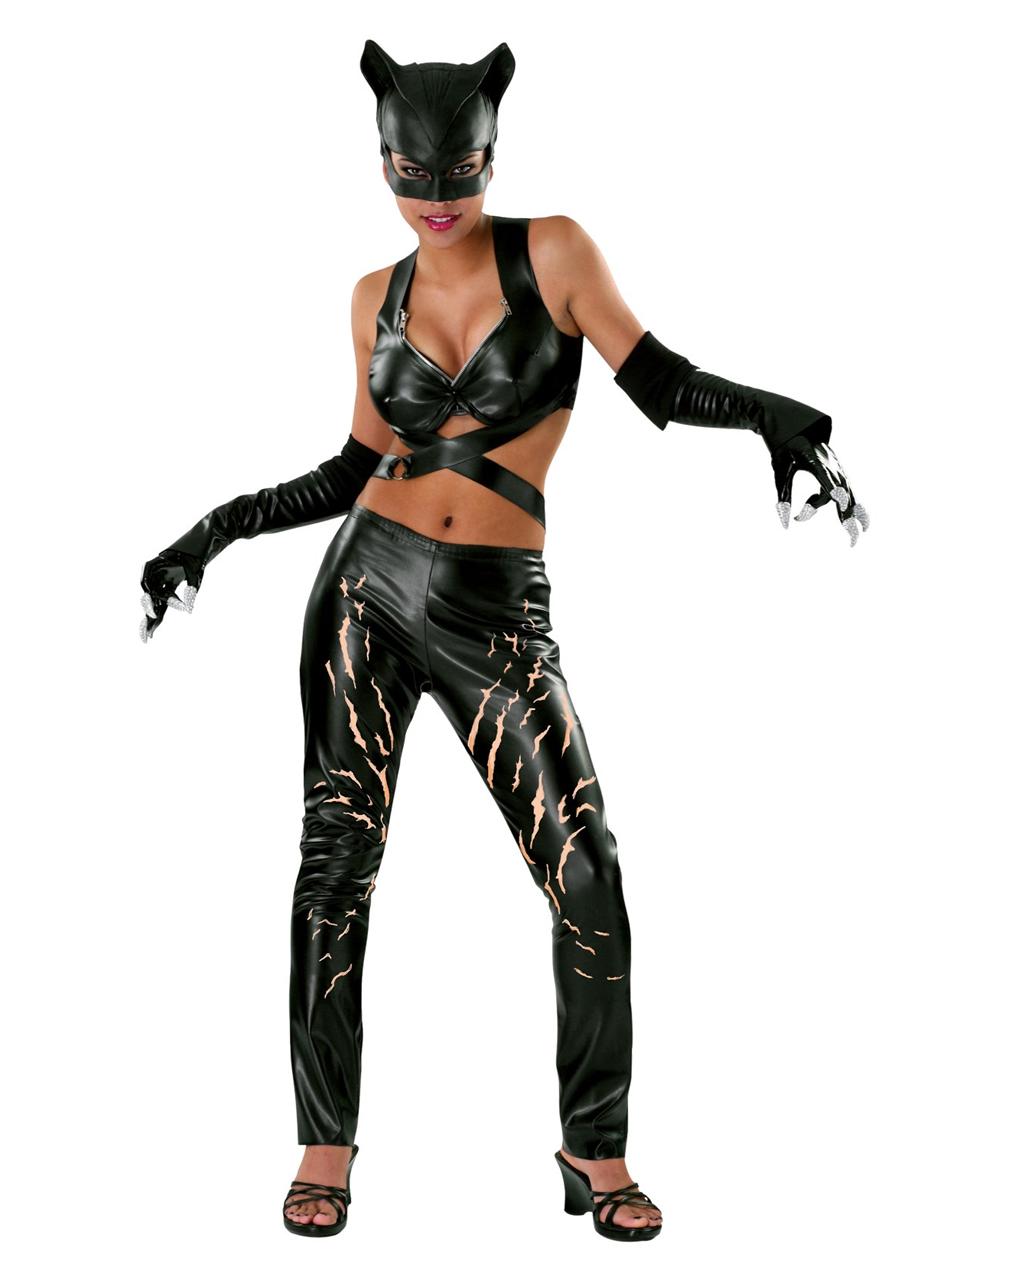 Make a Catwoman Costume